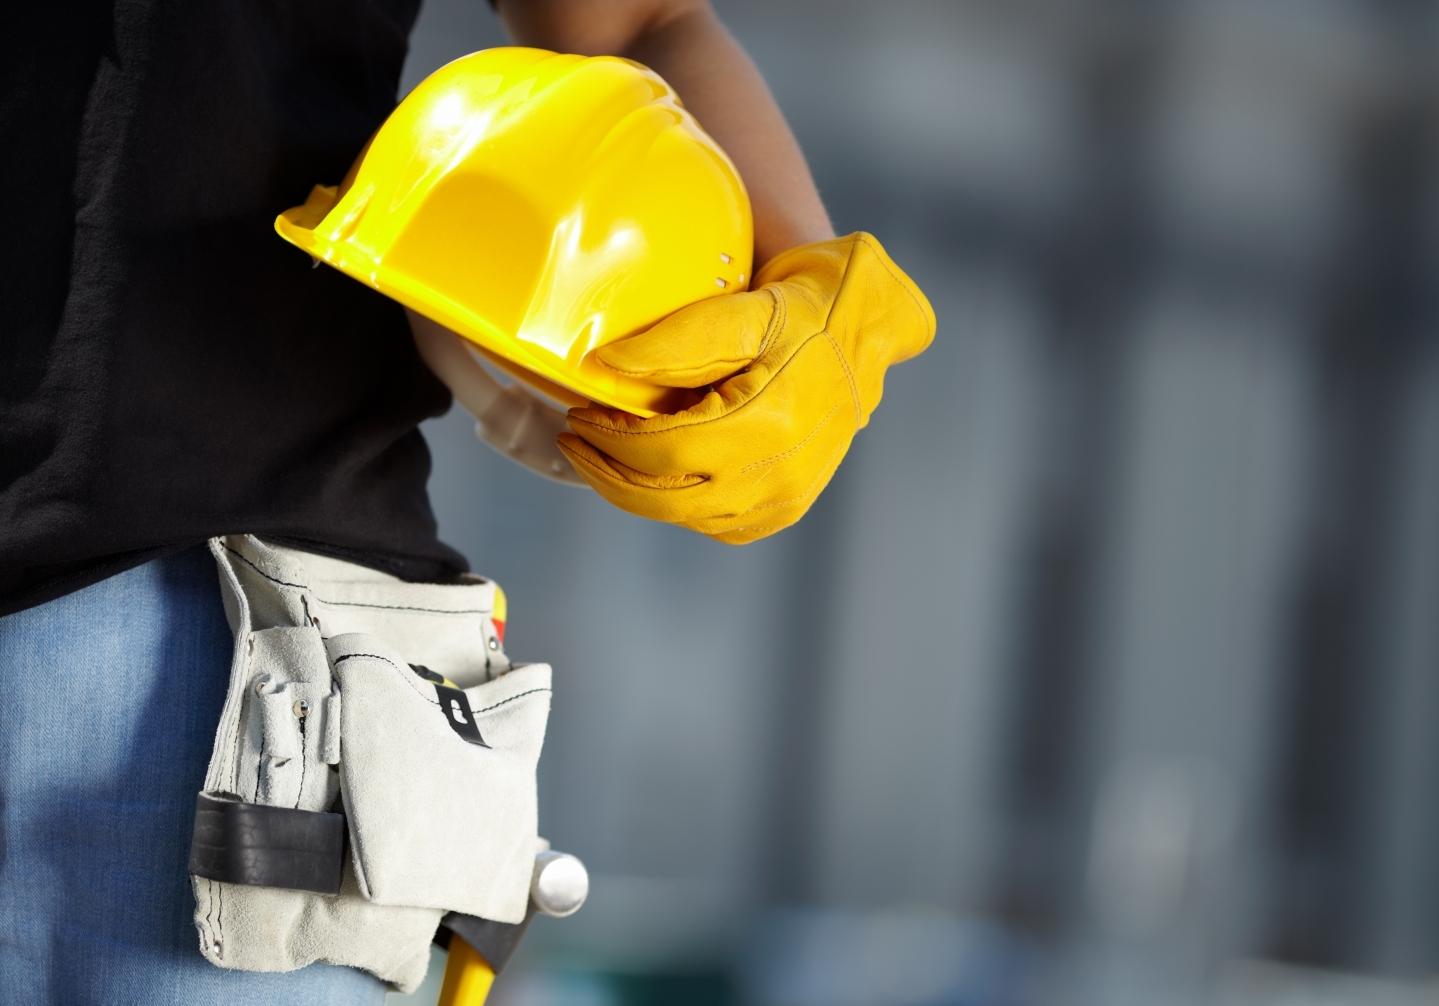 Helmet and work tools